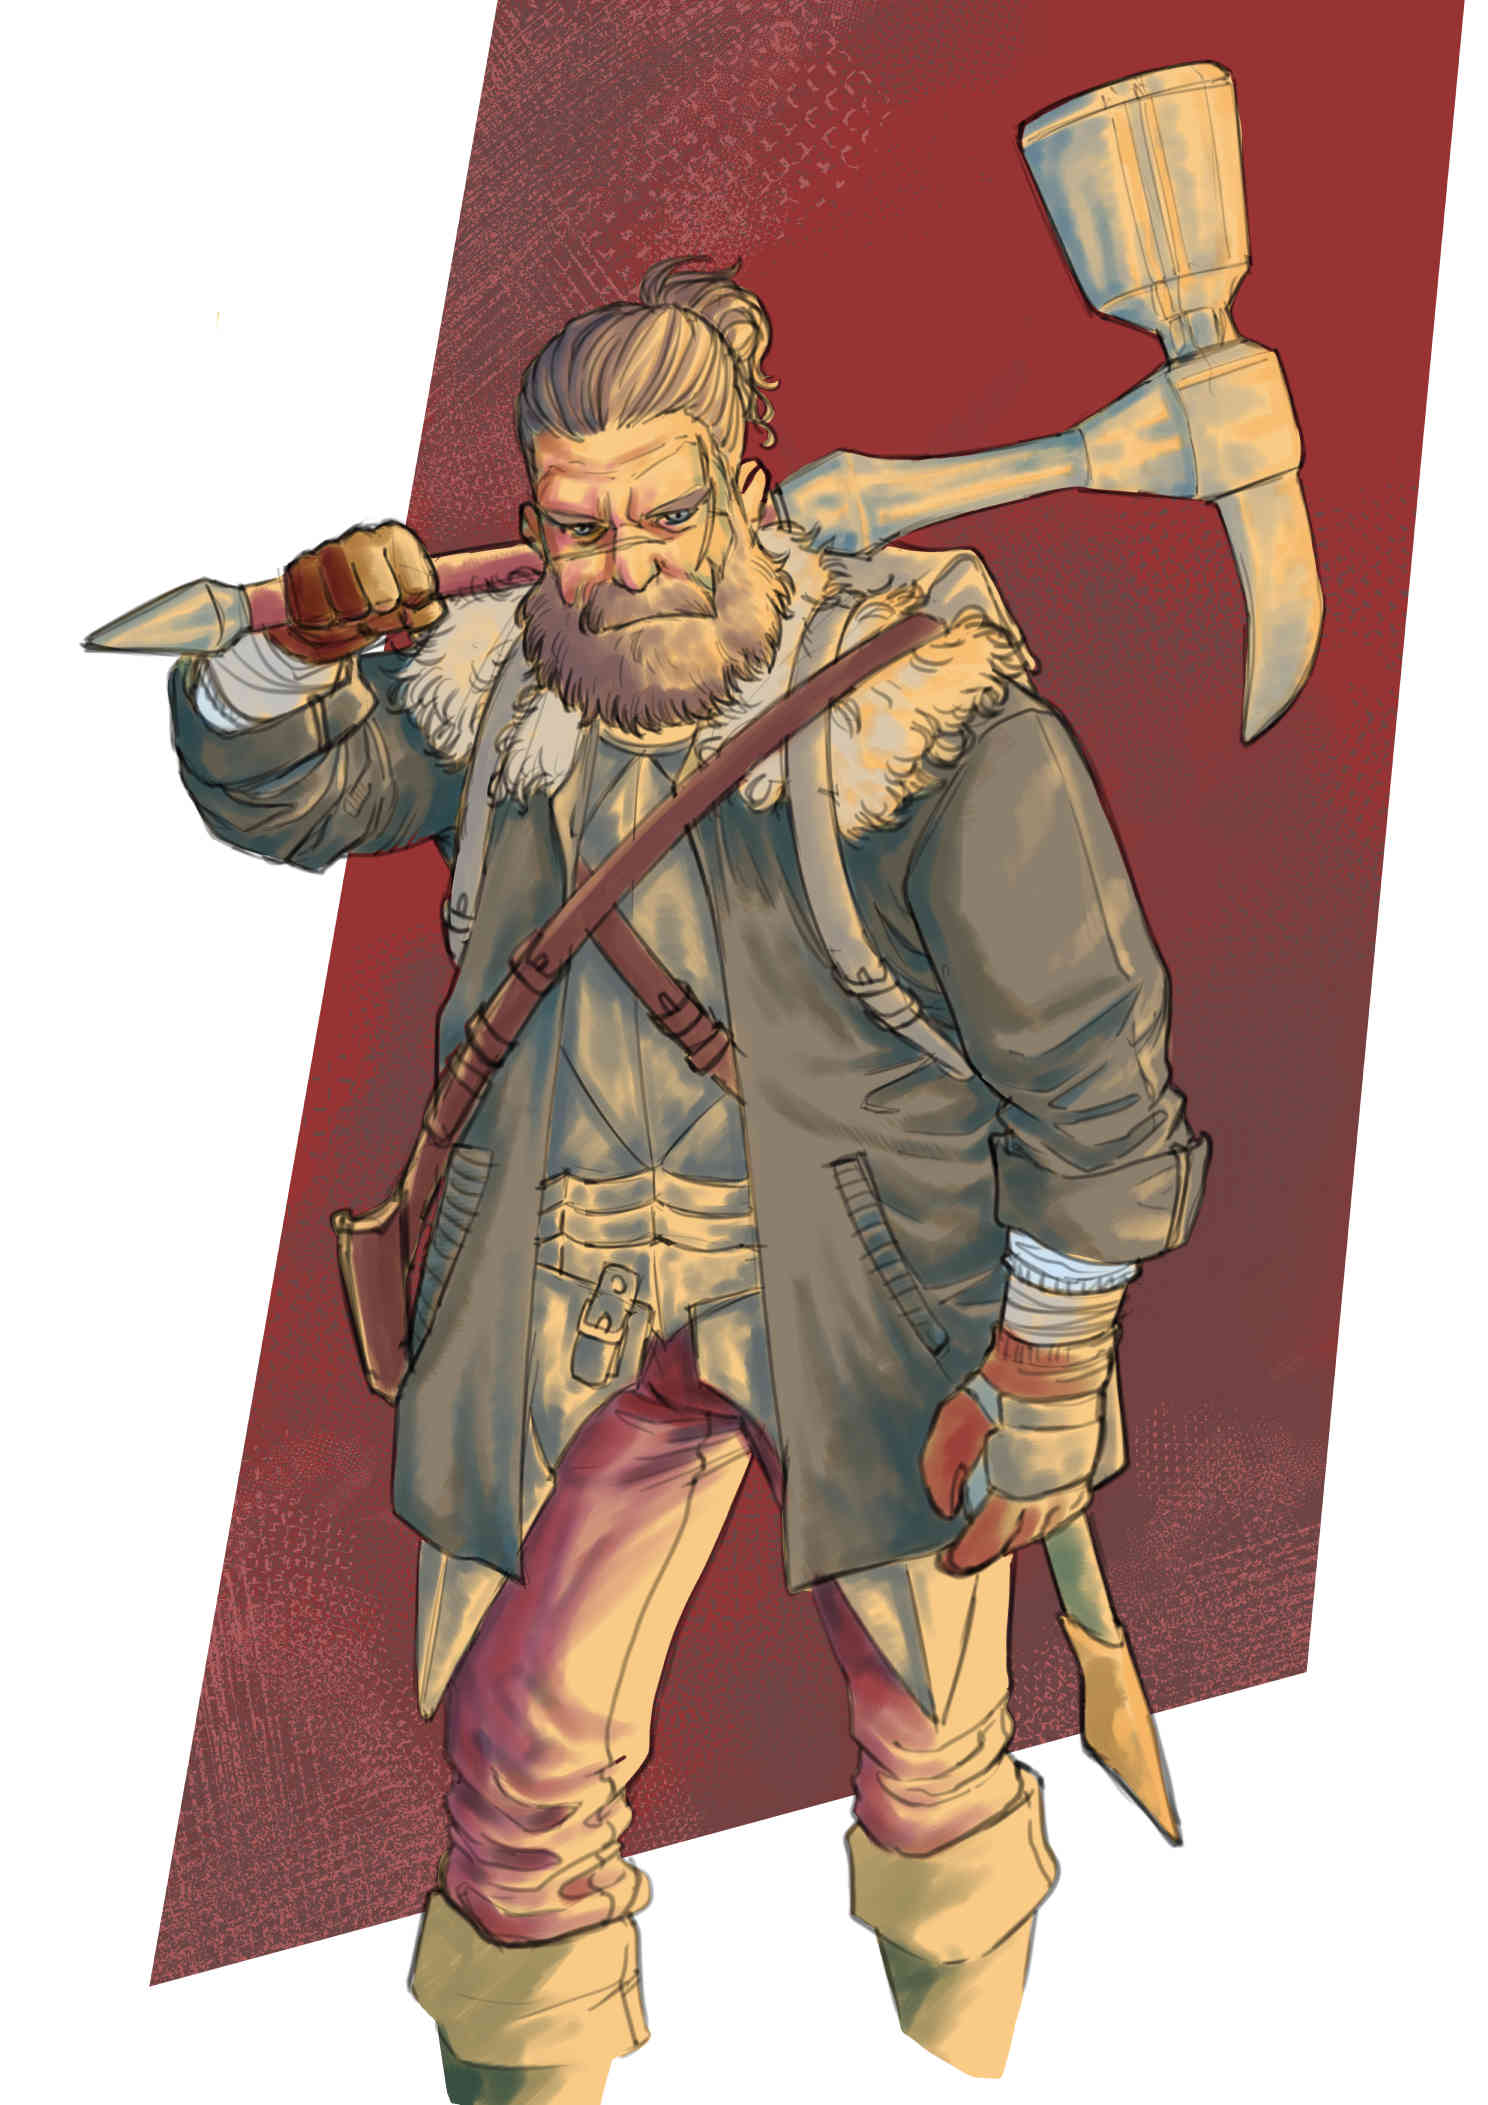 Arryn Warder Valley  - Digital Sketch, DnD character